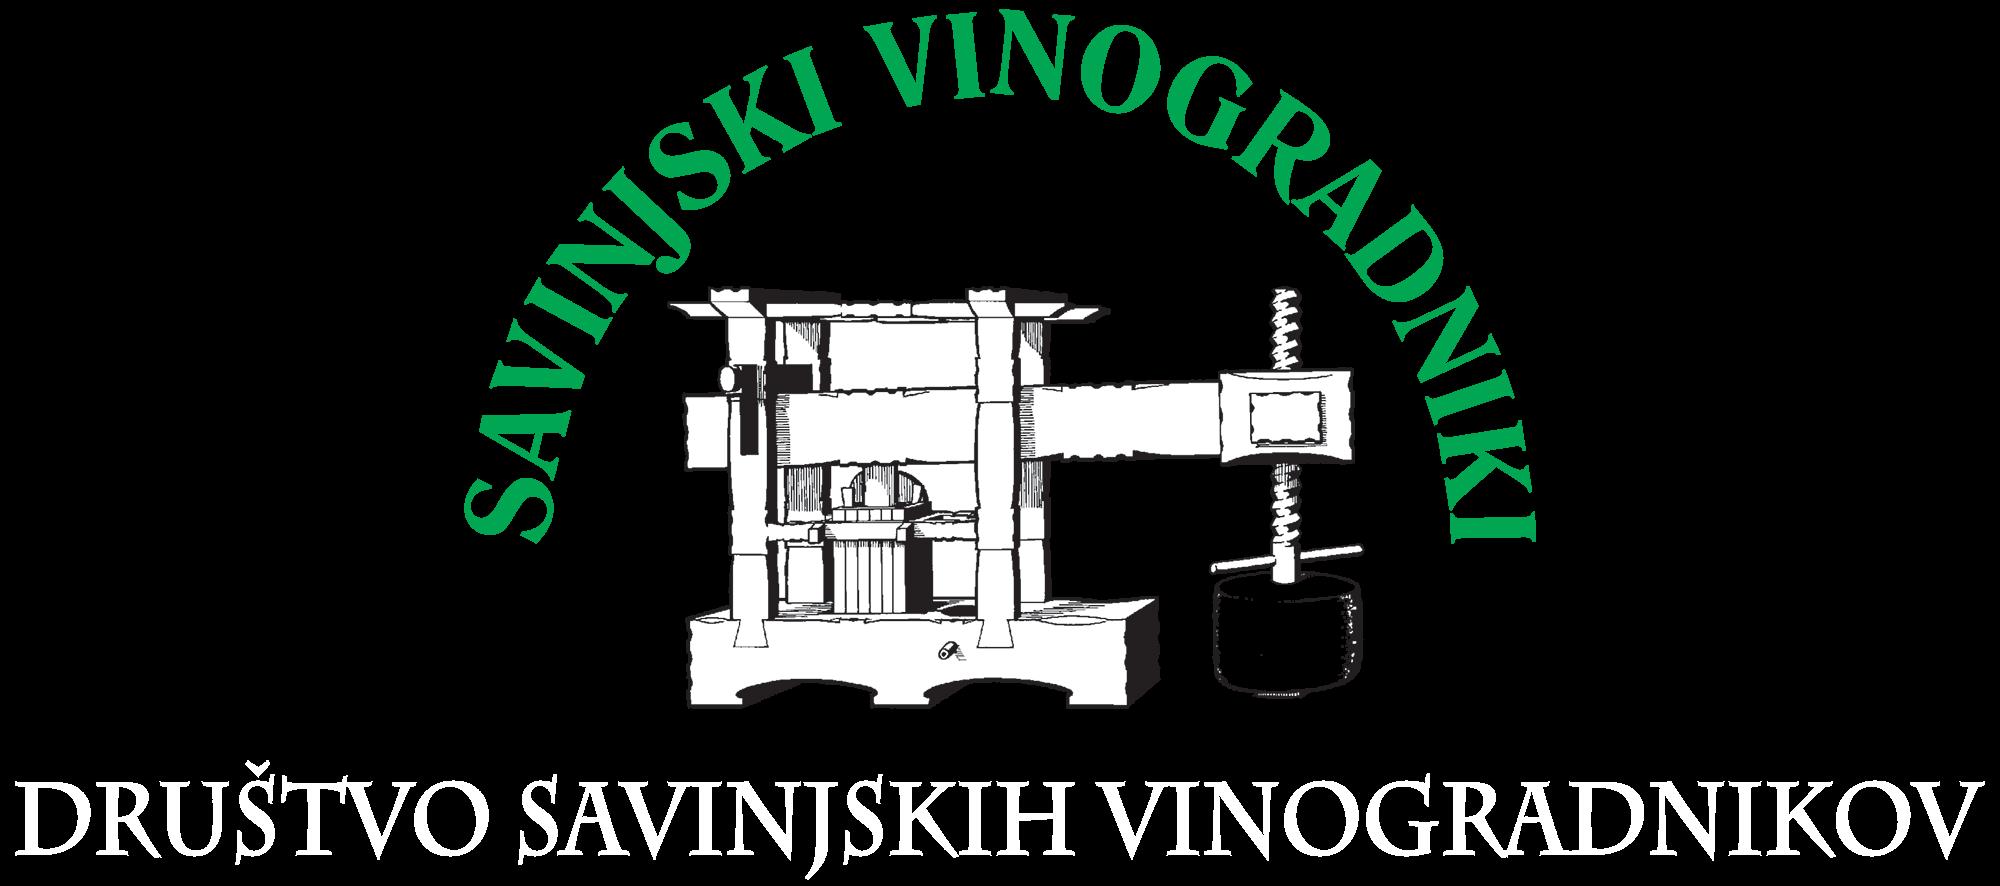 Društvo savinjskih vinogradnikov